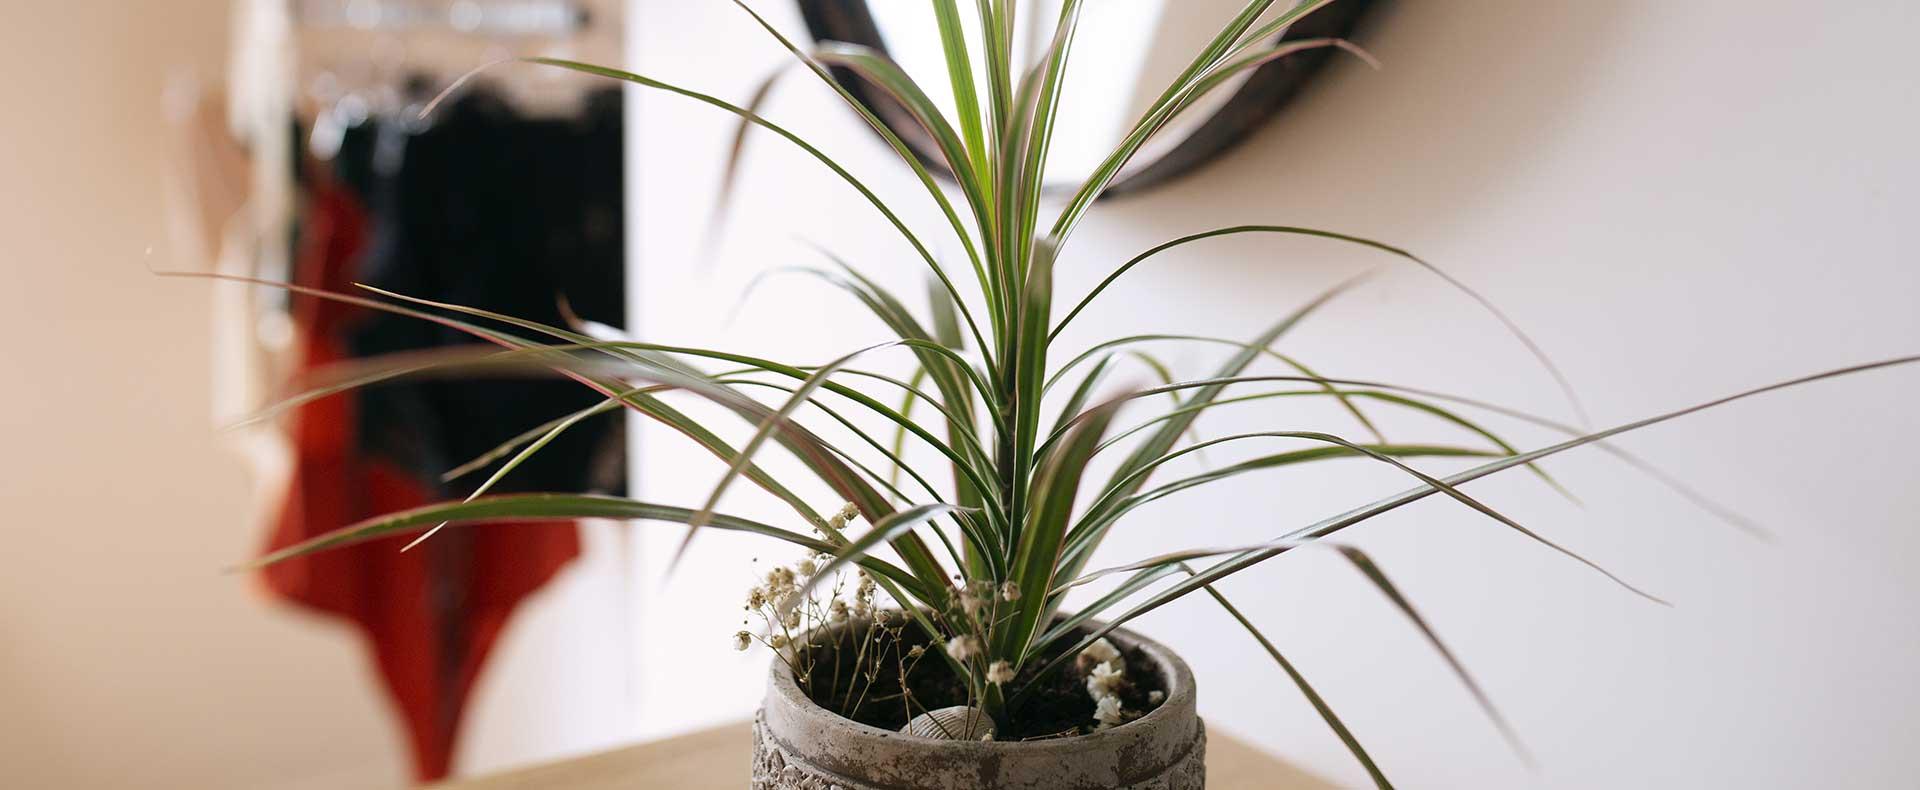 Plante-lingerie-suspendu-atelier